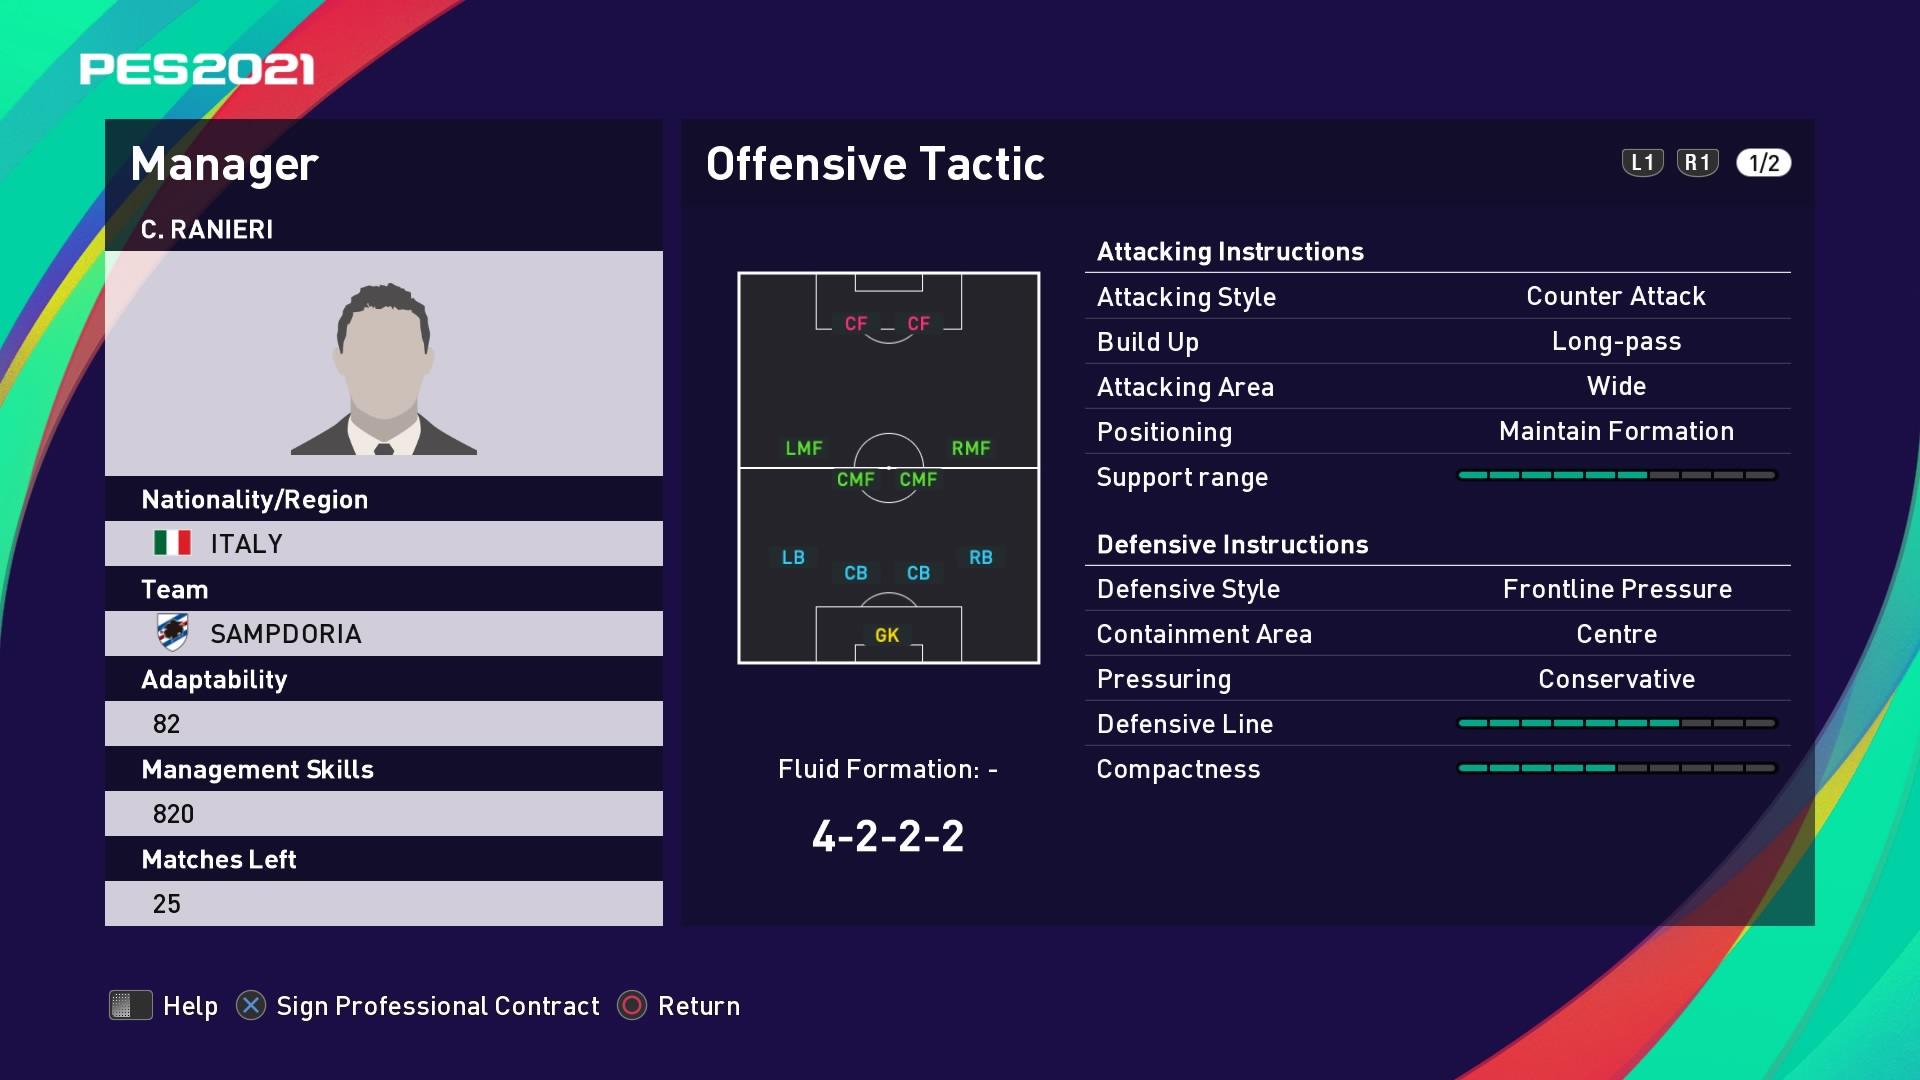 C. Ranieri (Claudio Ranieri) Offensive Tactic in PES 2021 myClub